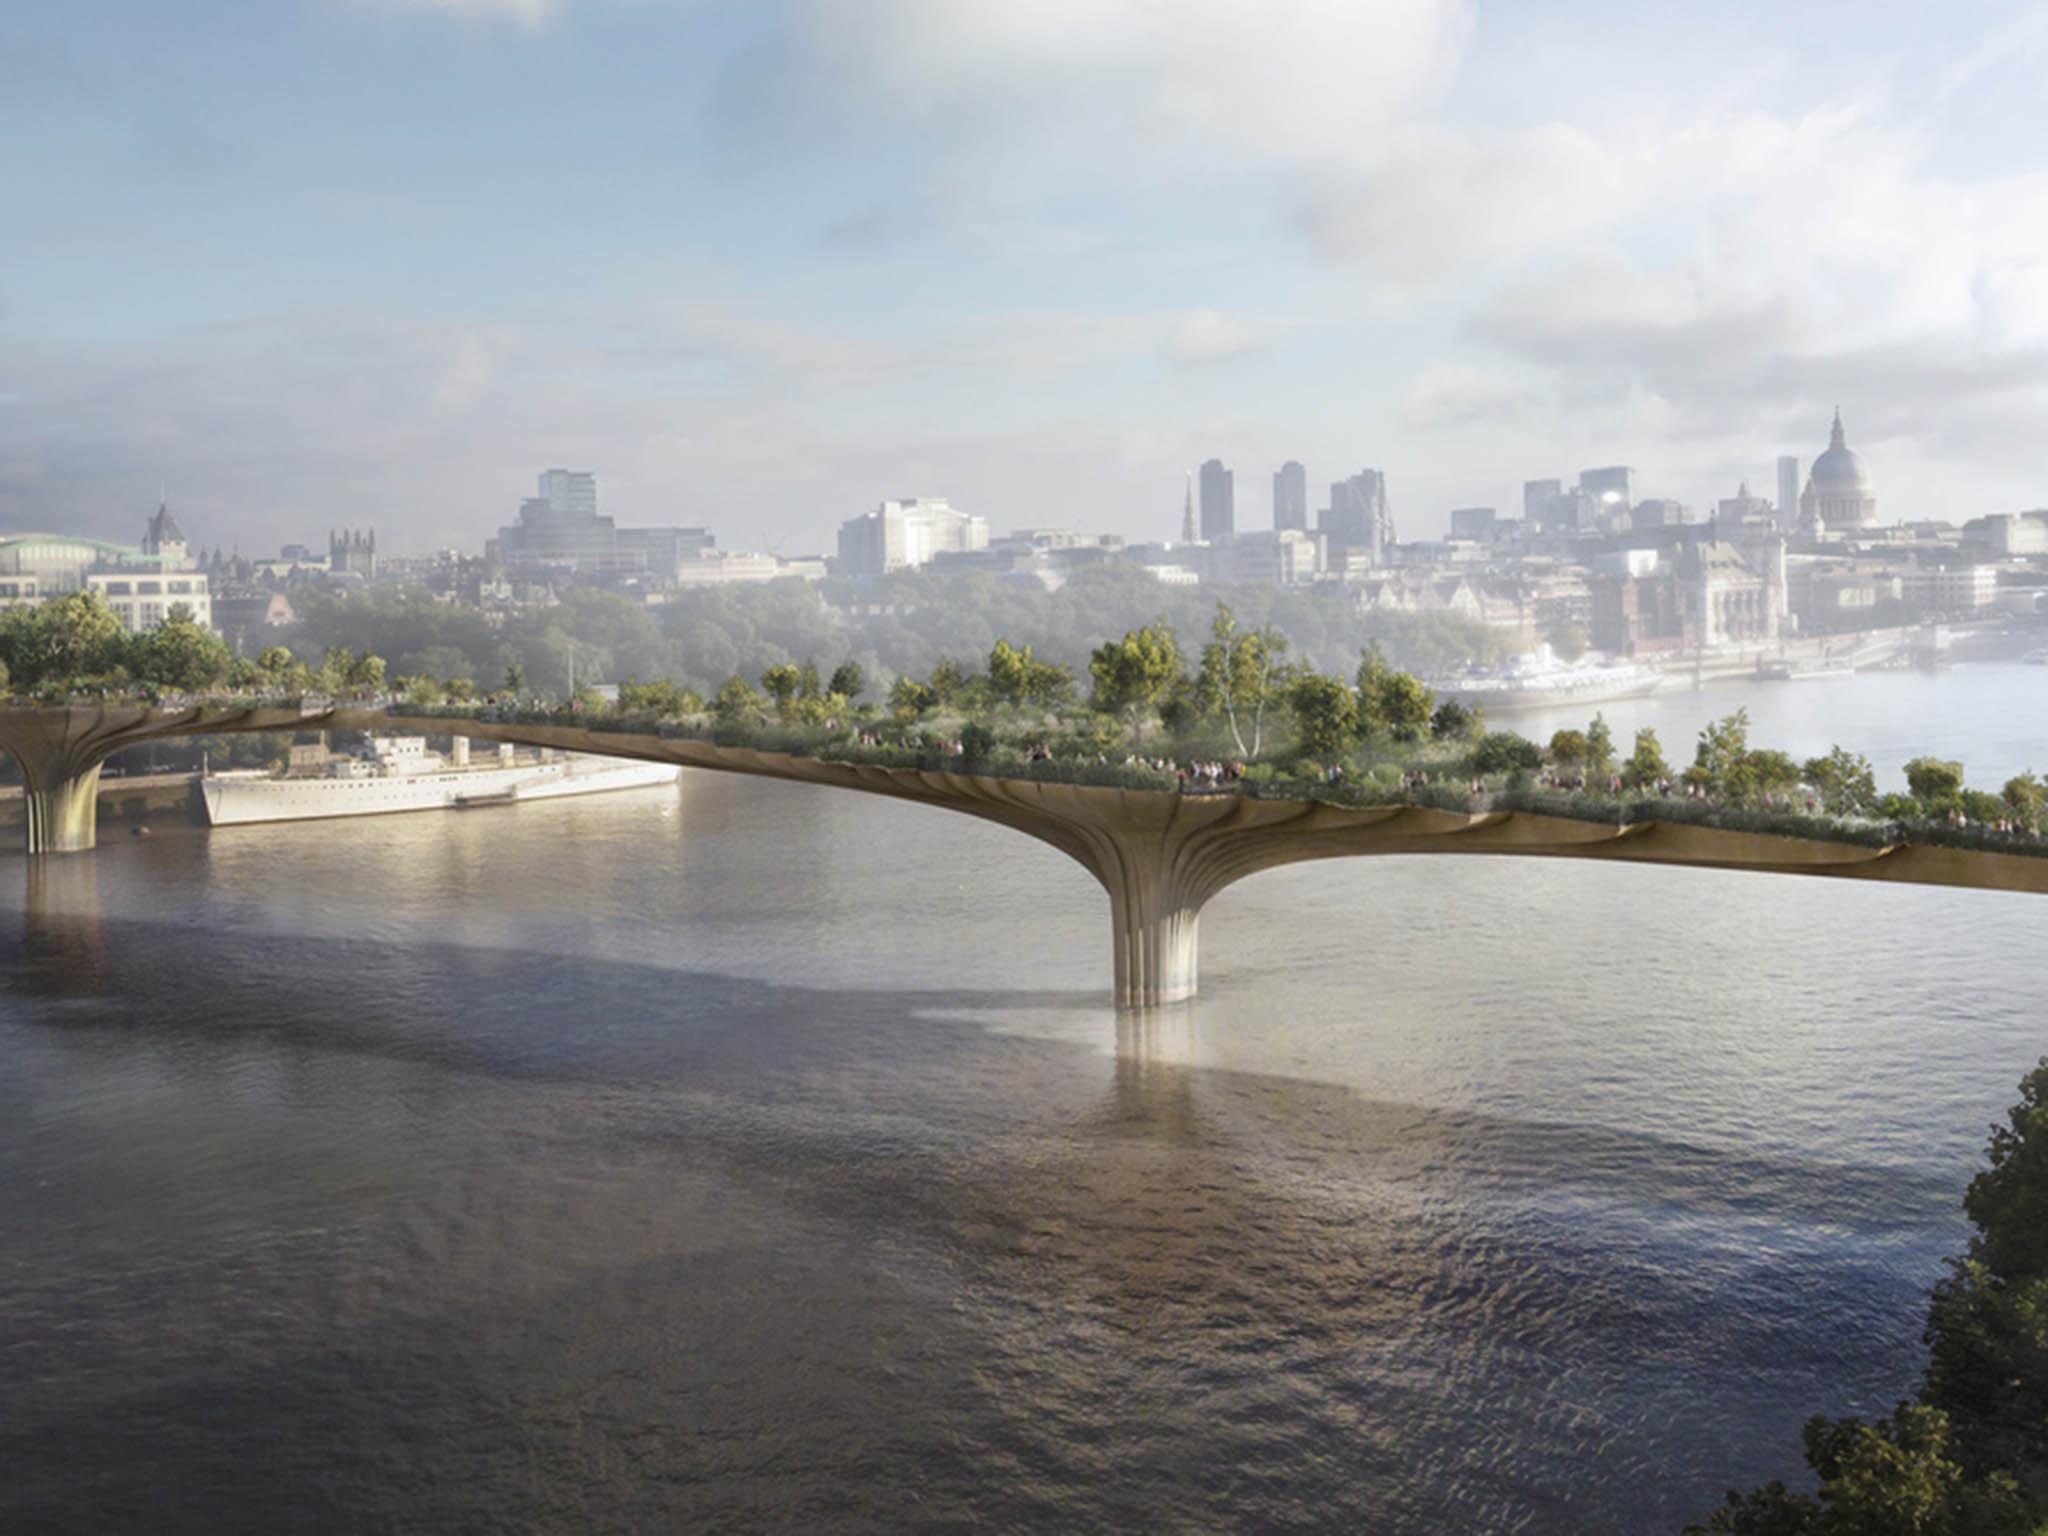 Failed projects, The Garden Bridge